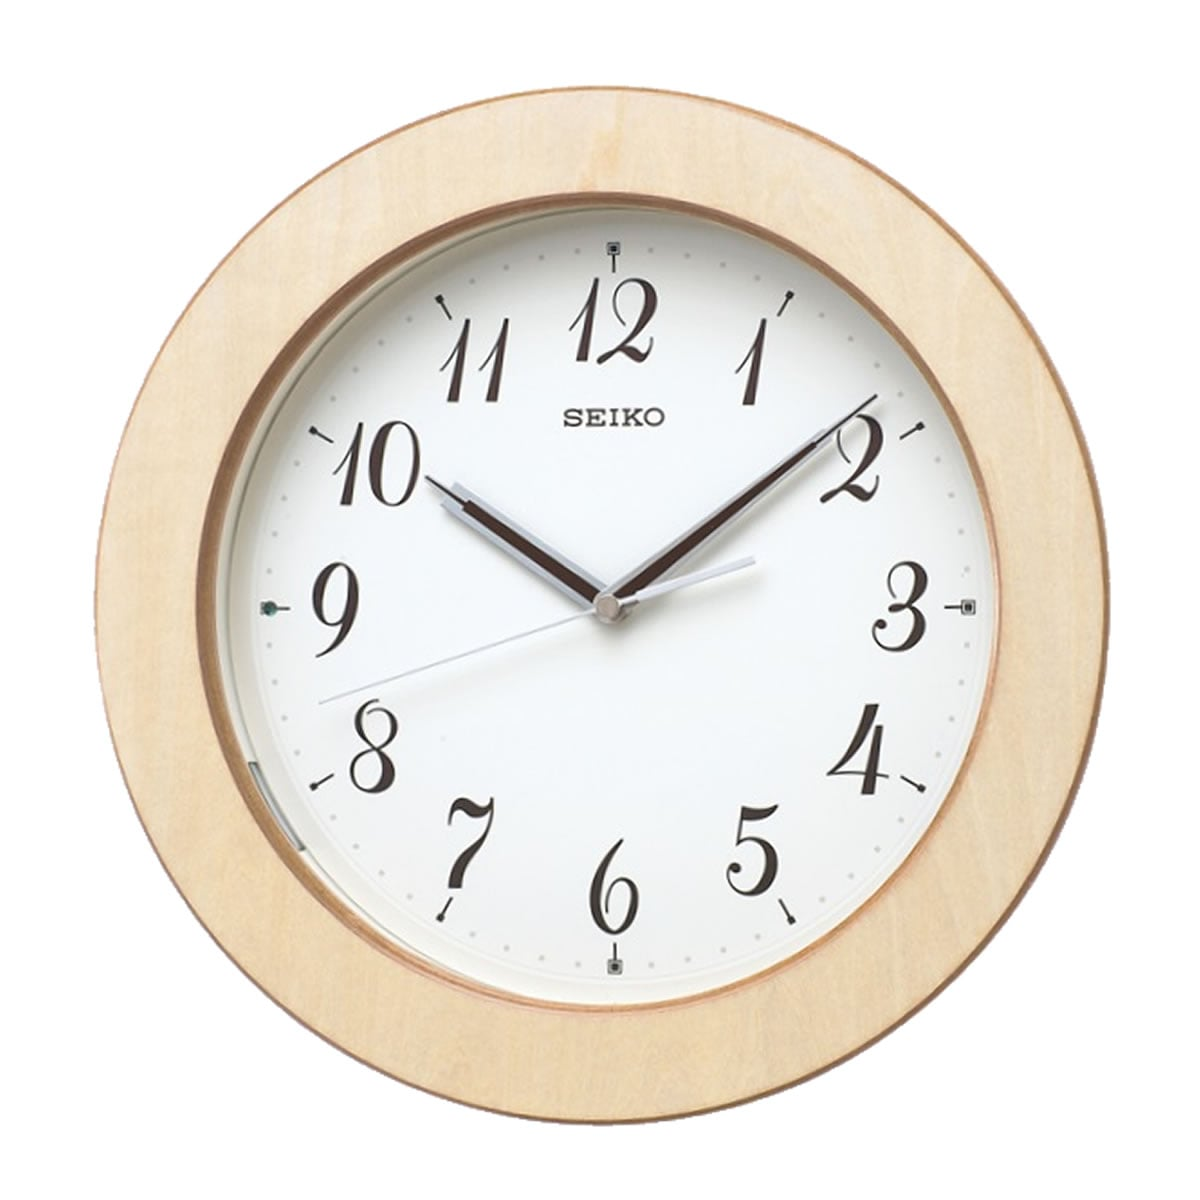 SEIKO(セイコー)木枠 夜光 電波掛け時計 KX216A